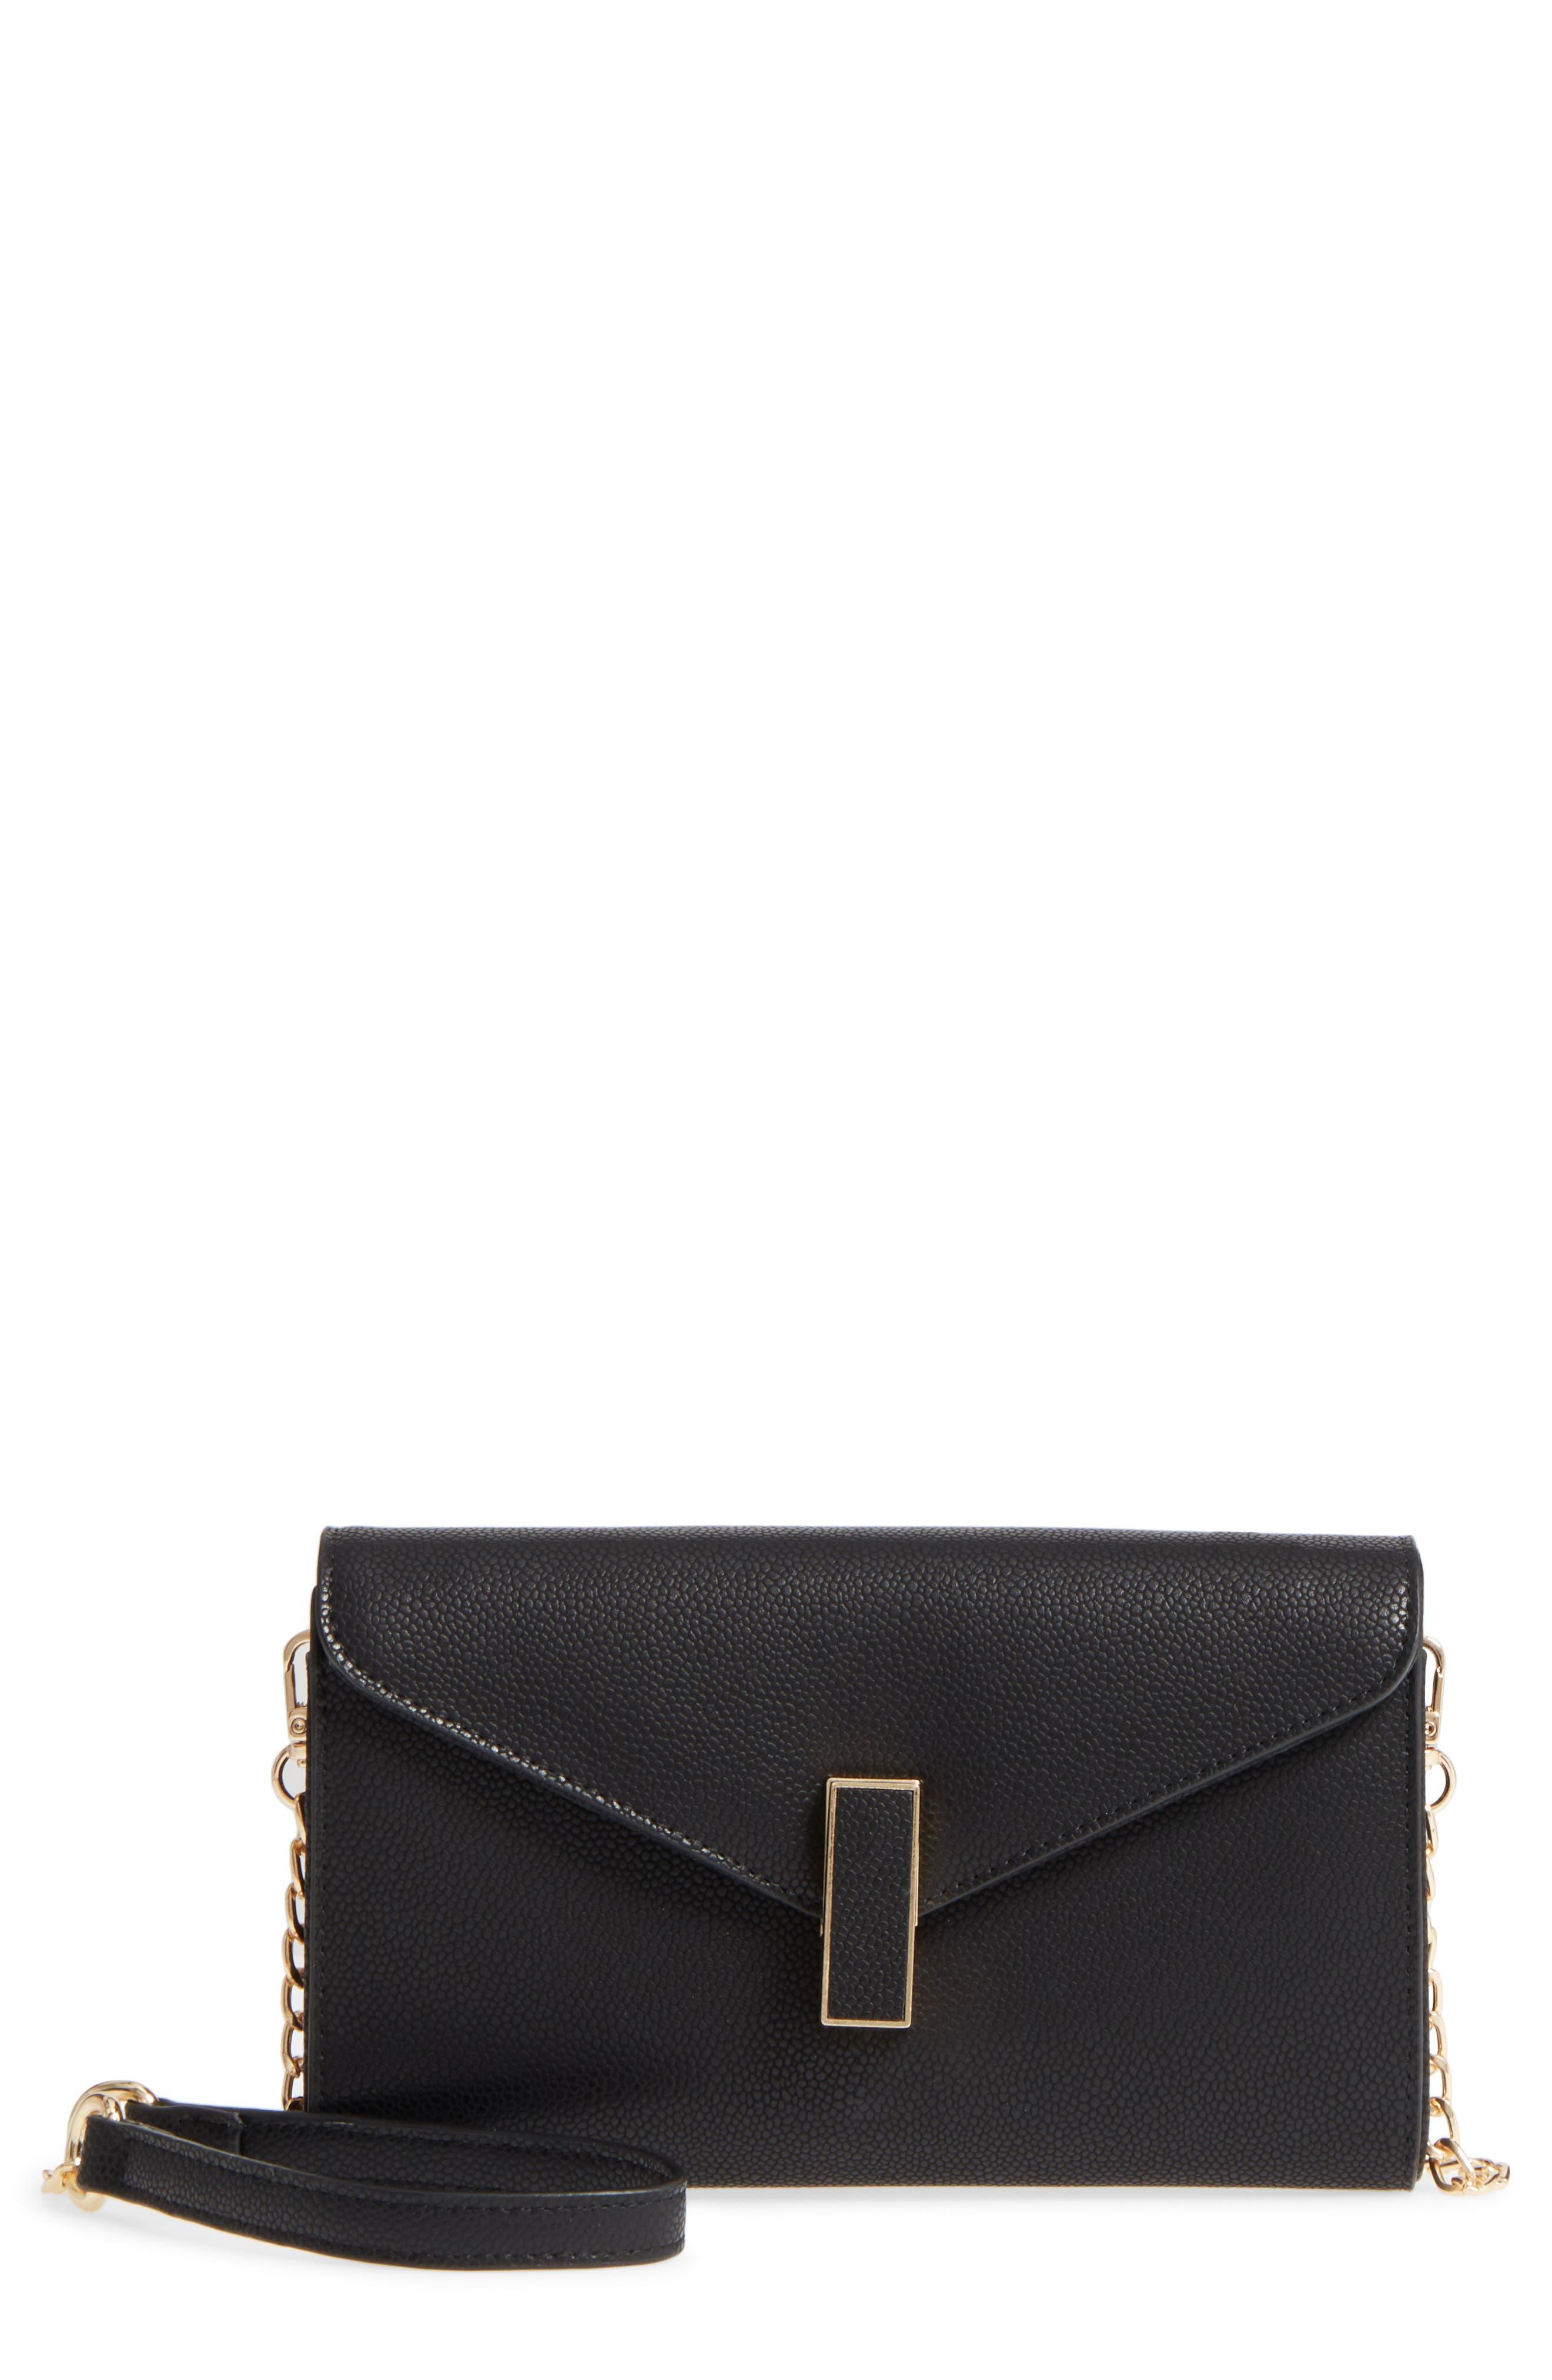 Alternate Image 1 Selected - Sondra Roberts Faux Leather Envelope Crossbody Bag